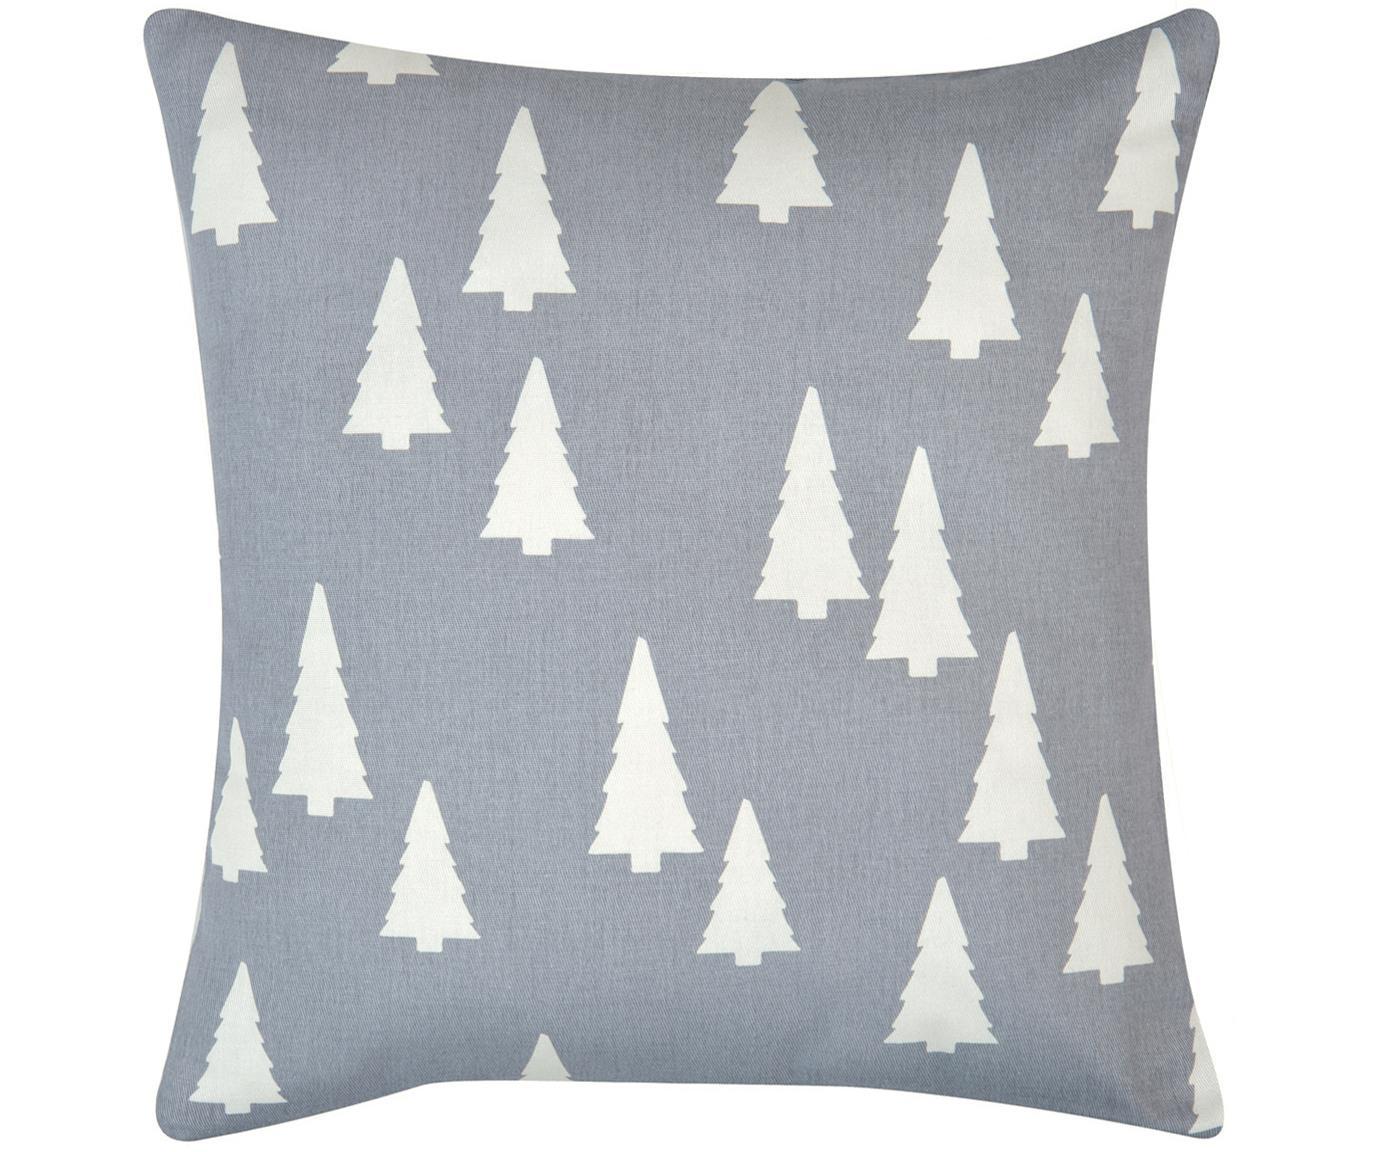 Federa arredo in grigio/bianco  Tree, Cotone, tessuto panama, Grigio, ecru, Larg. 40 x Lung. 40 cm